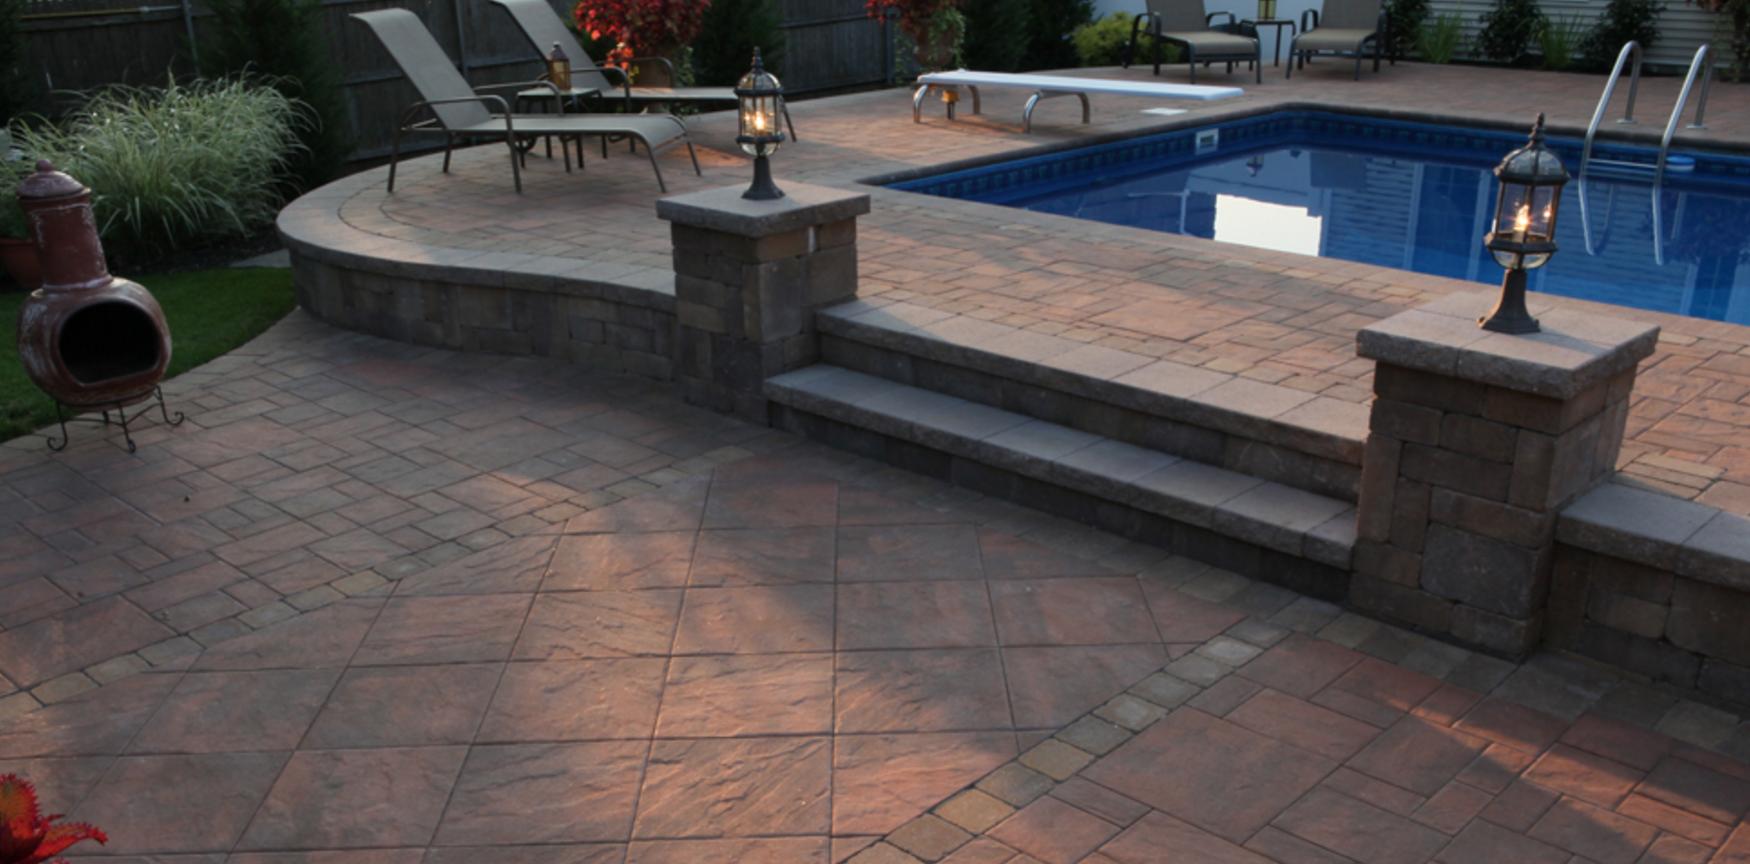 swimming pool patio with Cambridge paving stones in Nesconset, NY